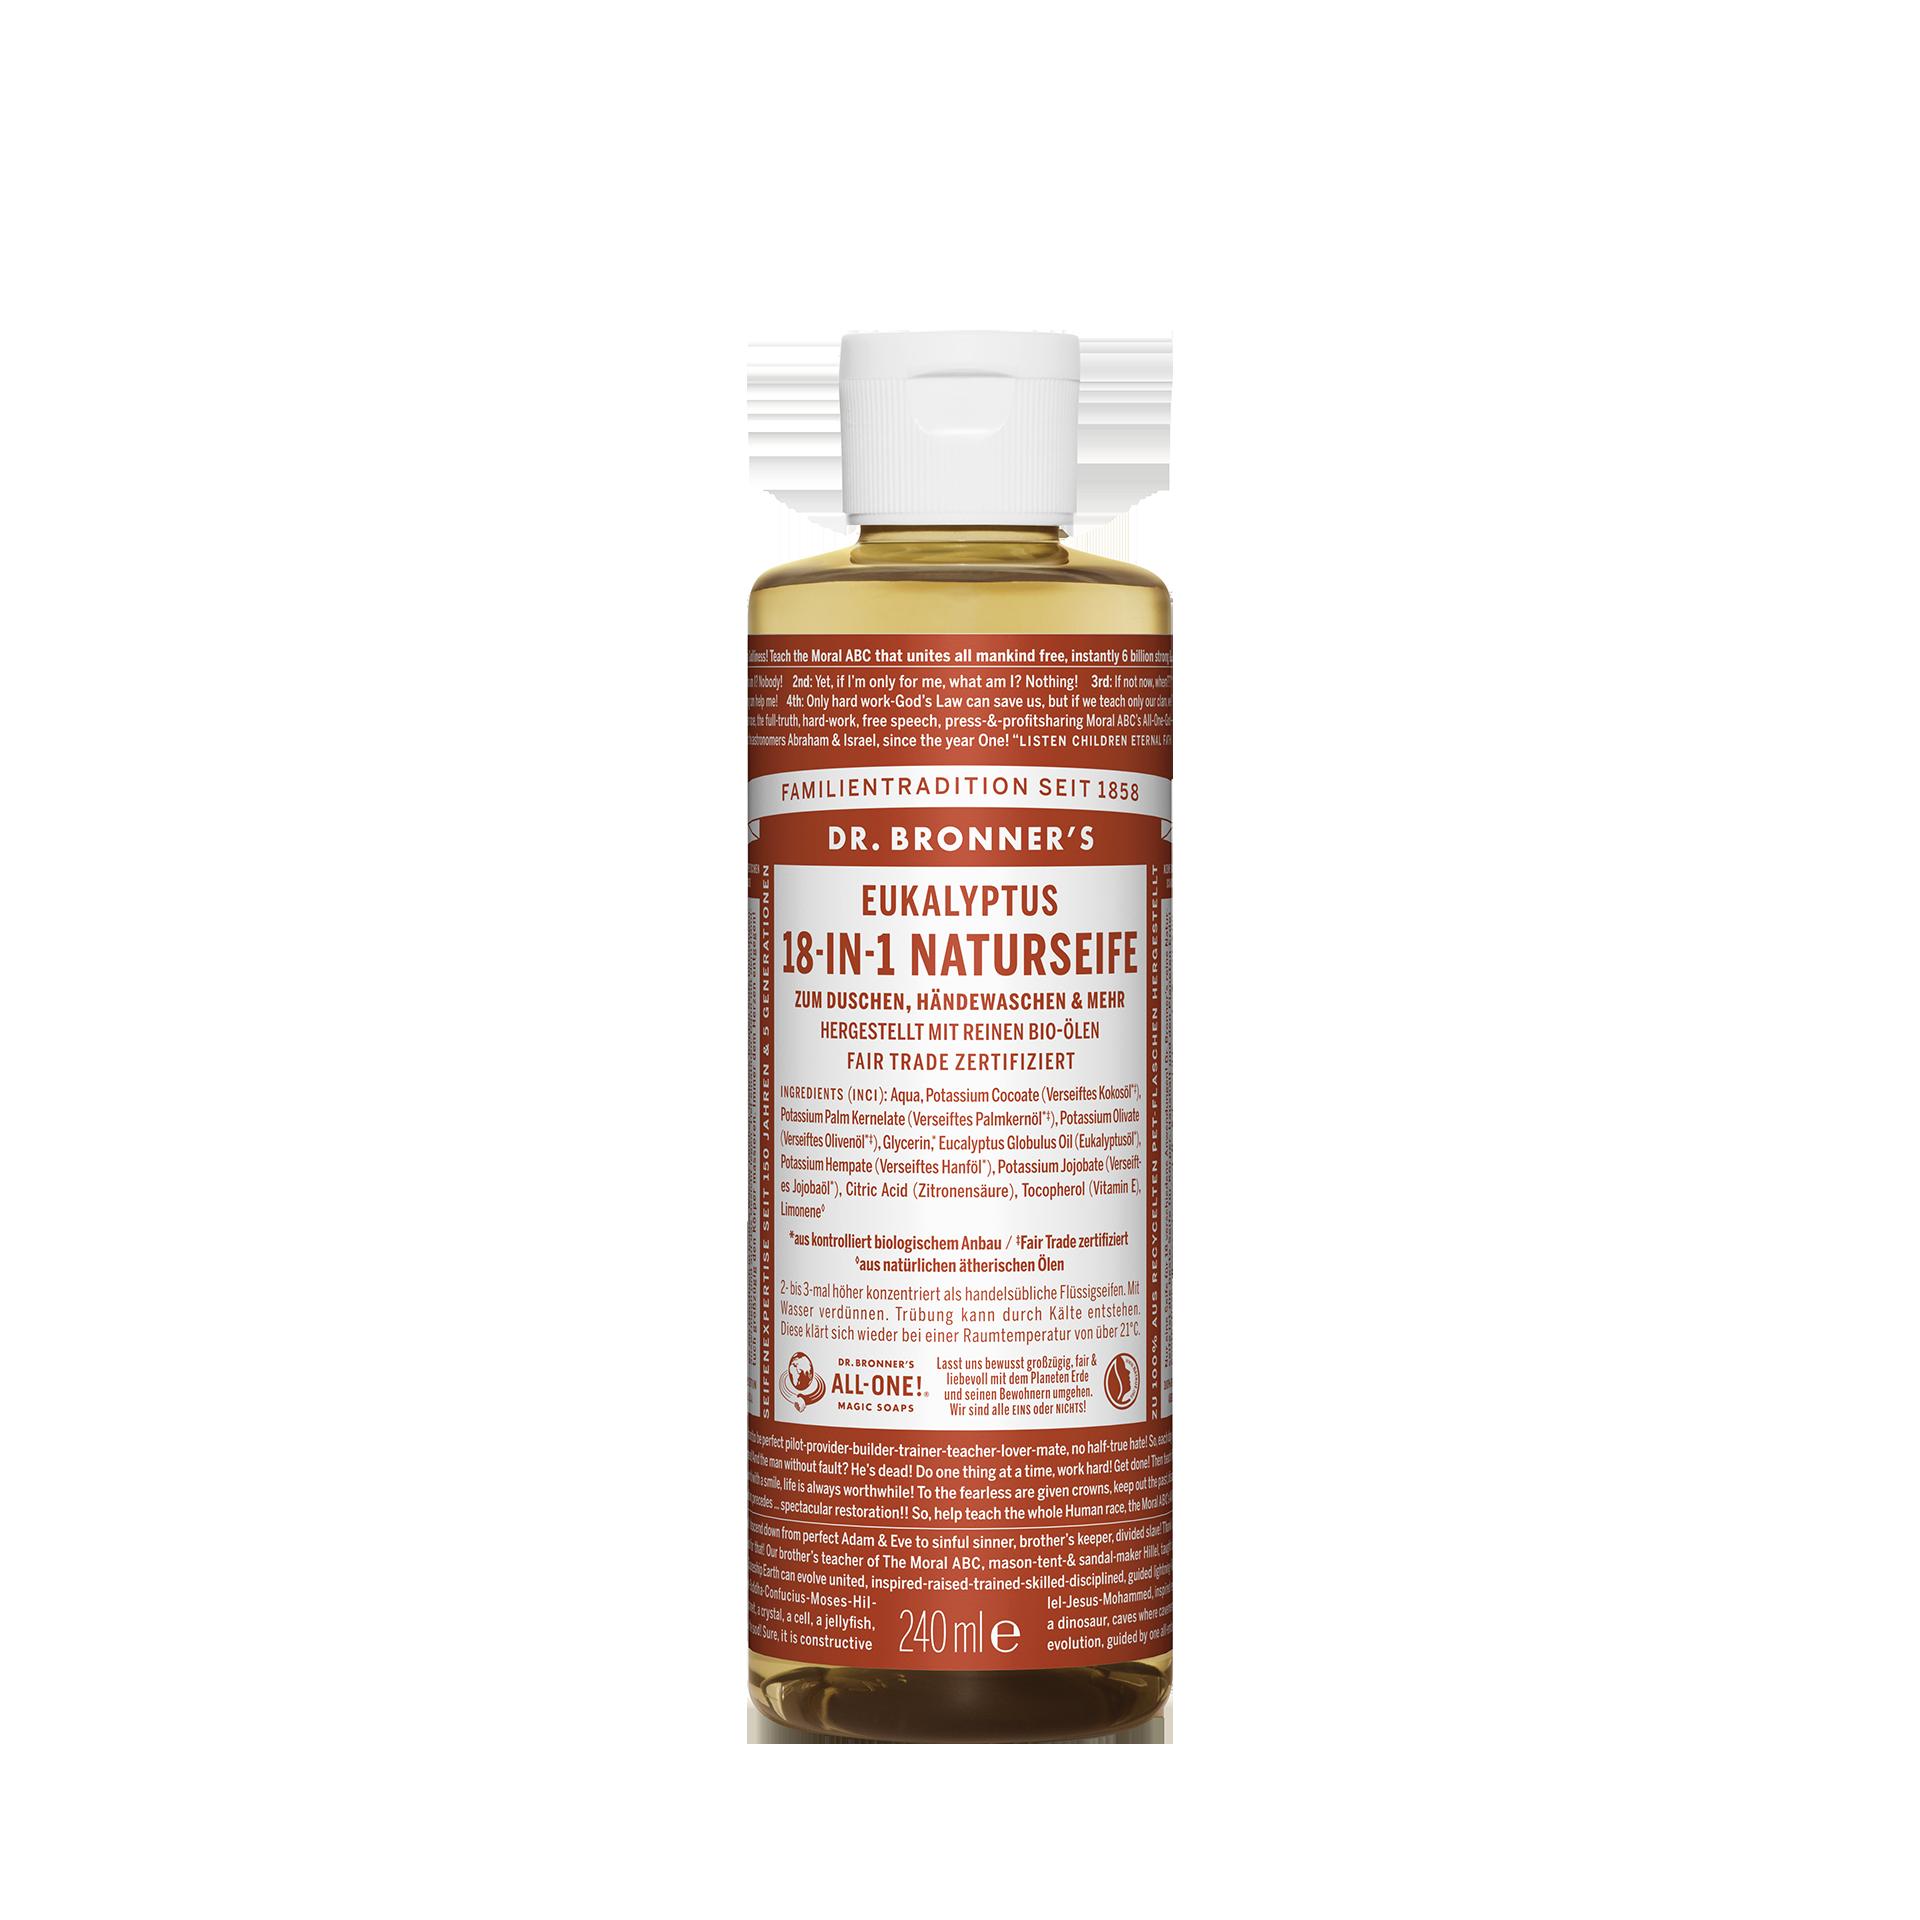 Dr. Bronner´s 18-in-1 Naturseife, Eukalyptus, 240 ml